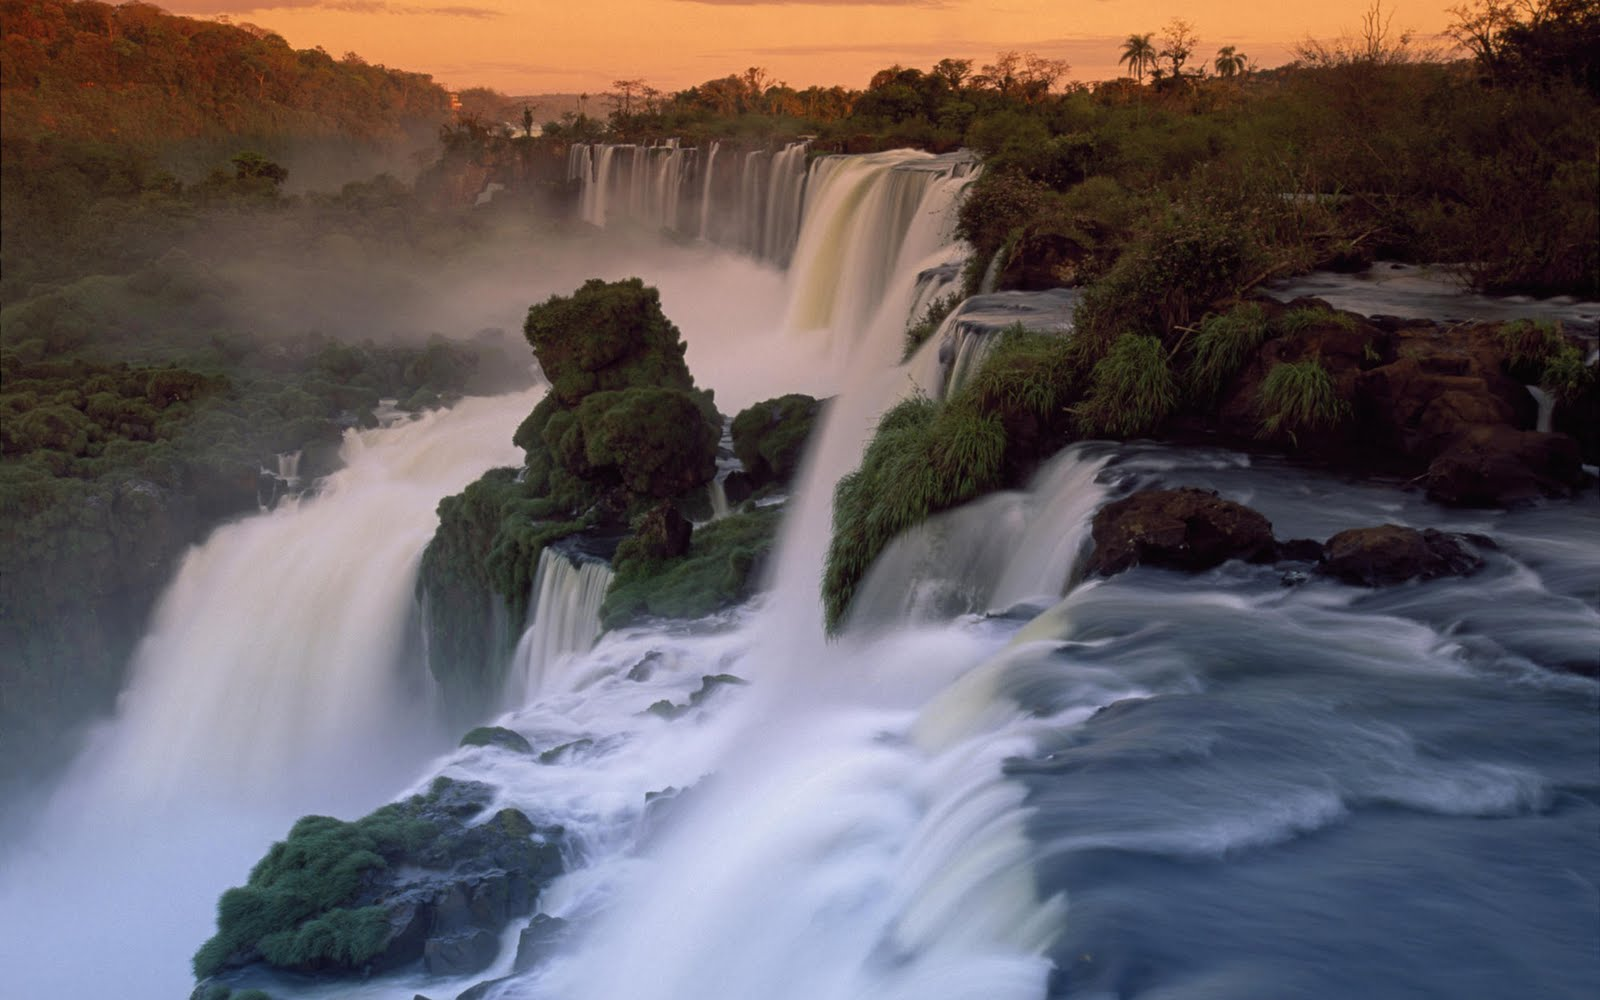 http://2.bp.blogspot.com/-mm4Mlur8A9E/TjBkLegywGI/AAAAAAAABZg/DDjR12wtEmw/s1600/iguazu-falls-brazil-argentina-nature-wallpaper-1920x1200-721.jpg